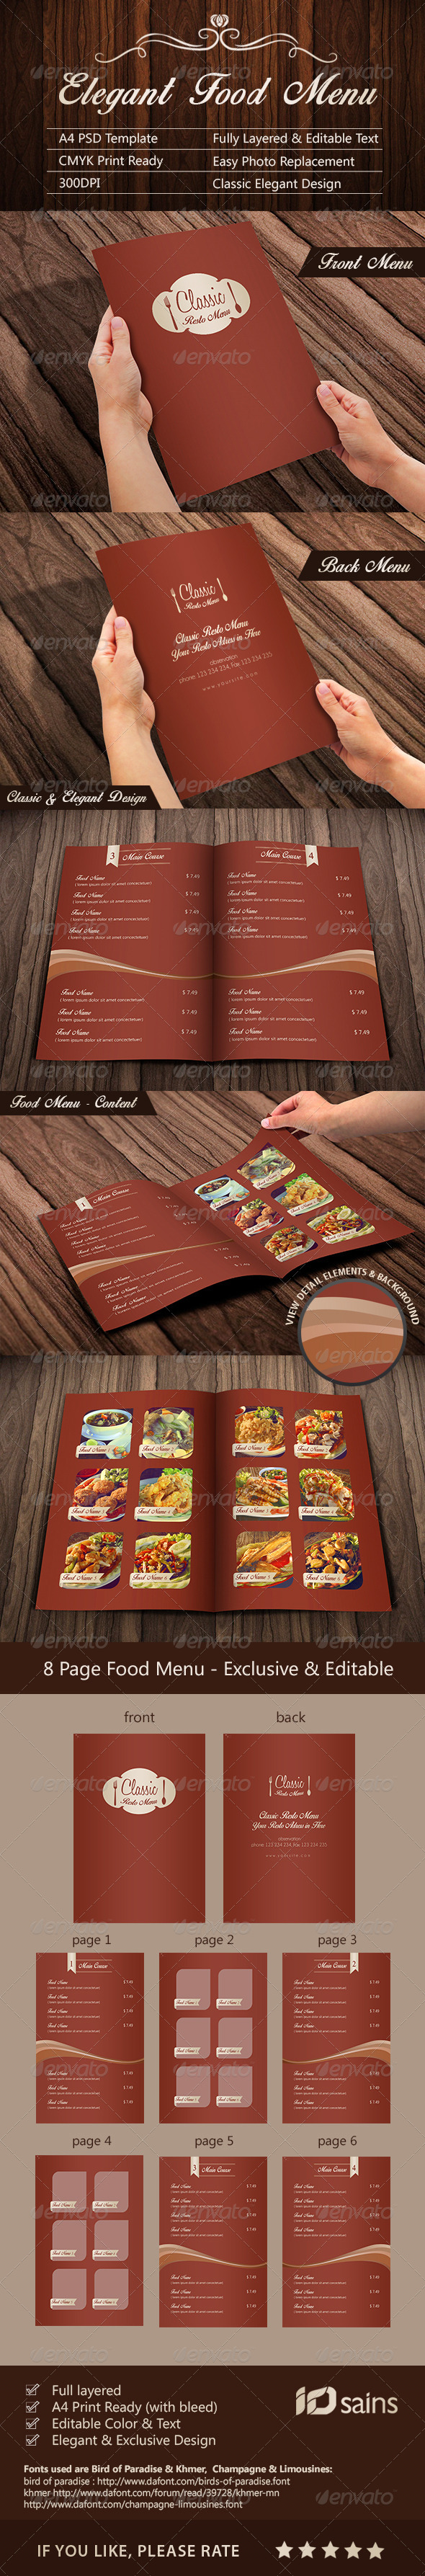 GraphicRiver Elegant Food Menu Template 8631196